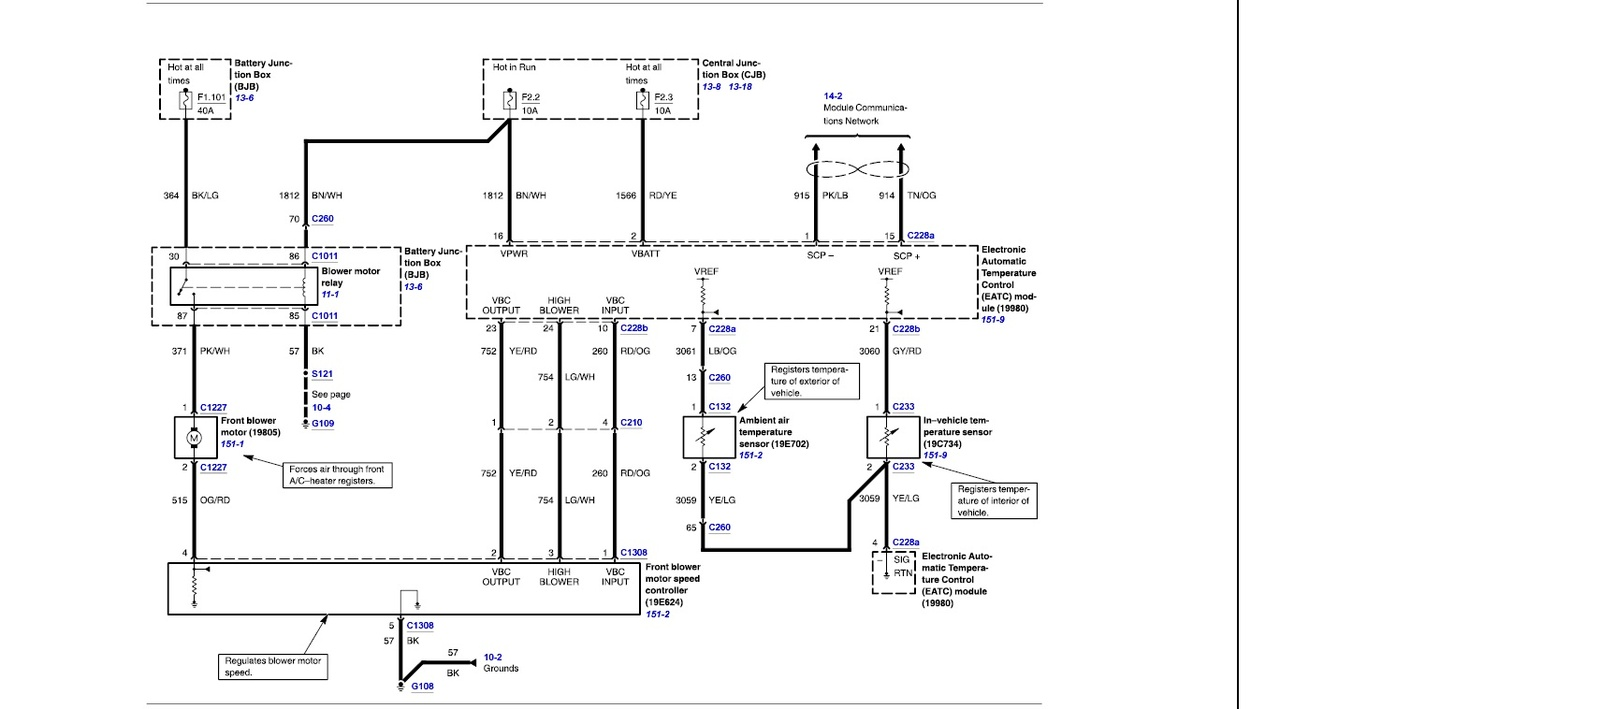 21CB12 2001 Silverado Climate Control Wiring Diagram | Wiring Library Wiring Library